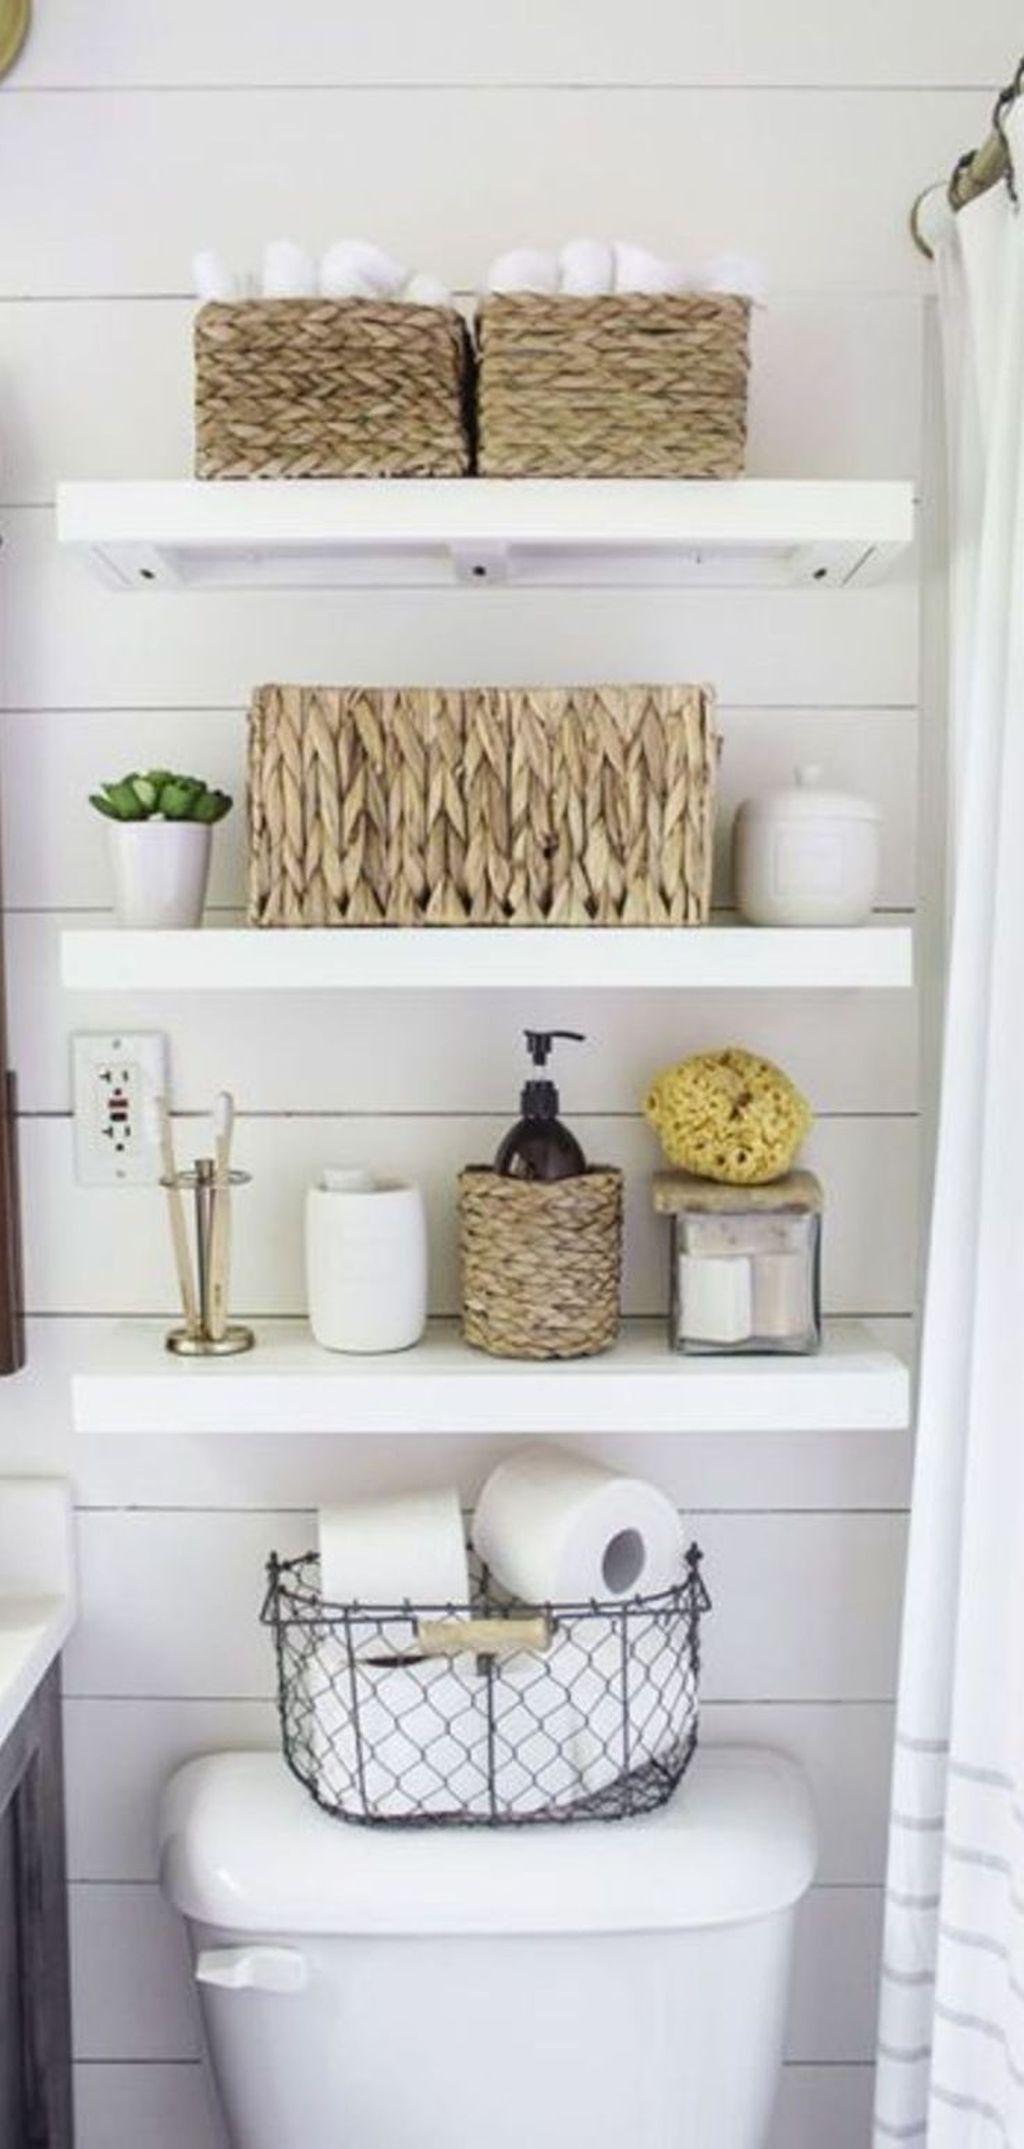 37 Affordable Bathroom Organization Storage Ideas To Try Many People Think That As Long Bathroom Space Saver Small Bathroom Shelves Small Bathroom Organization